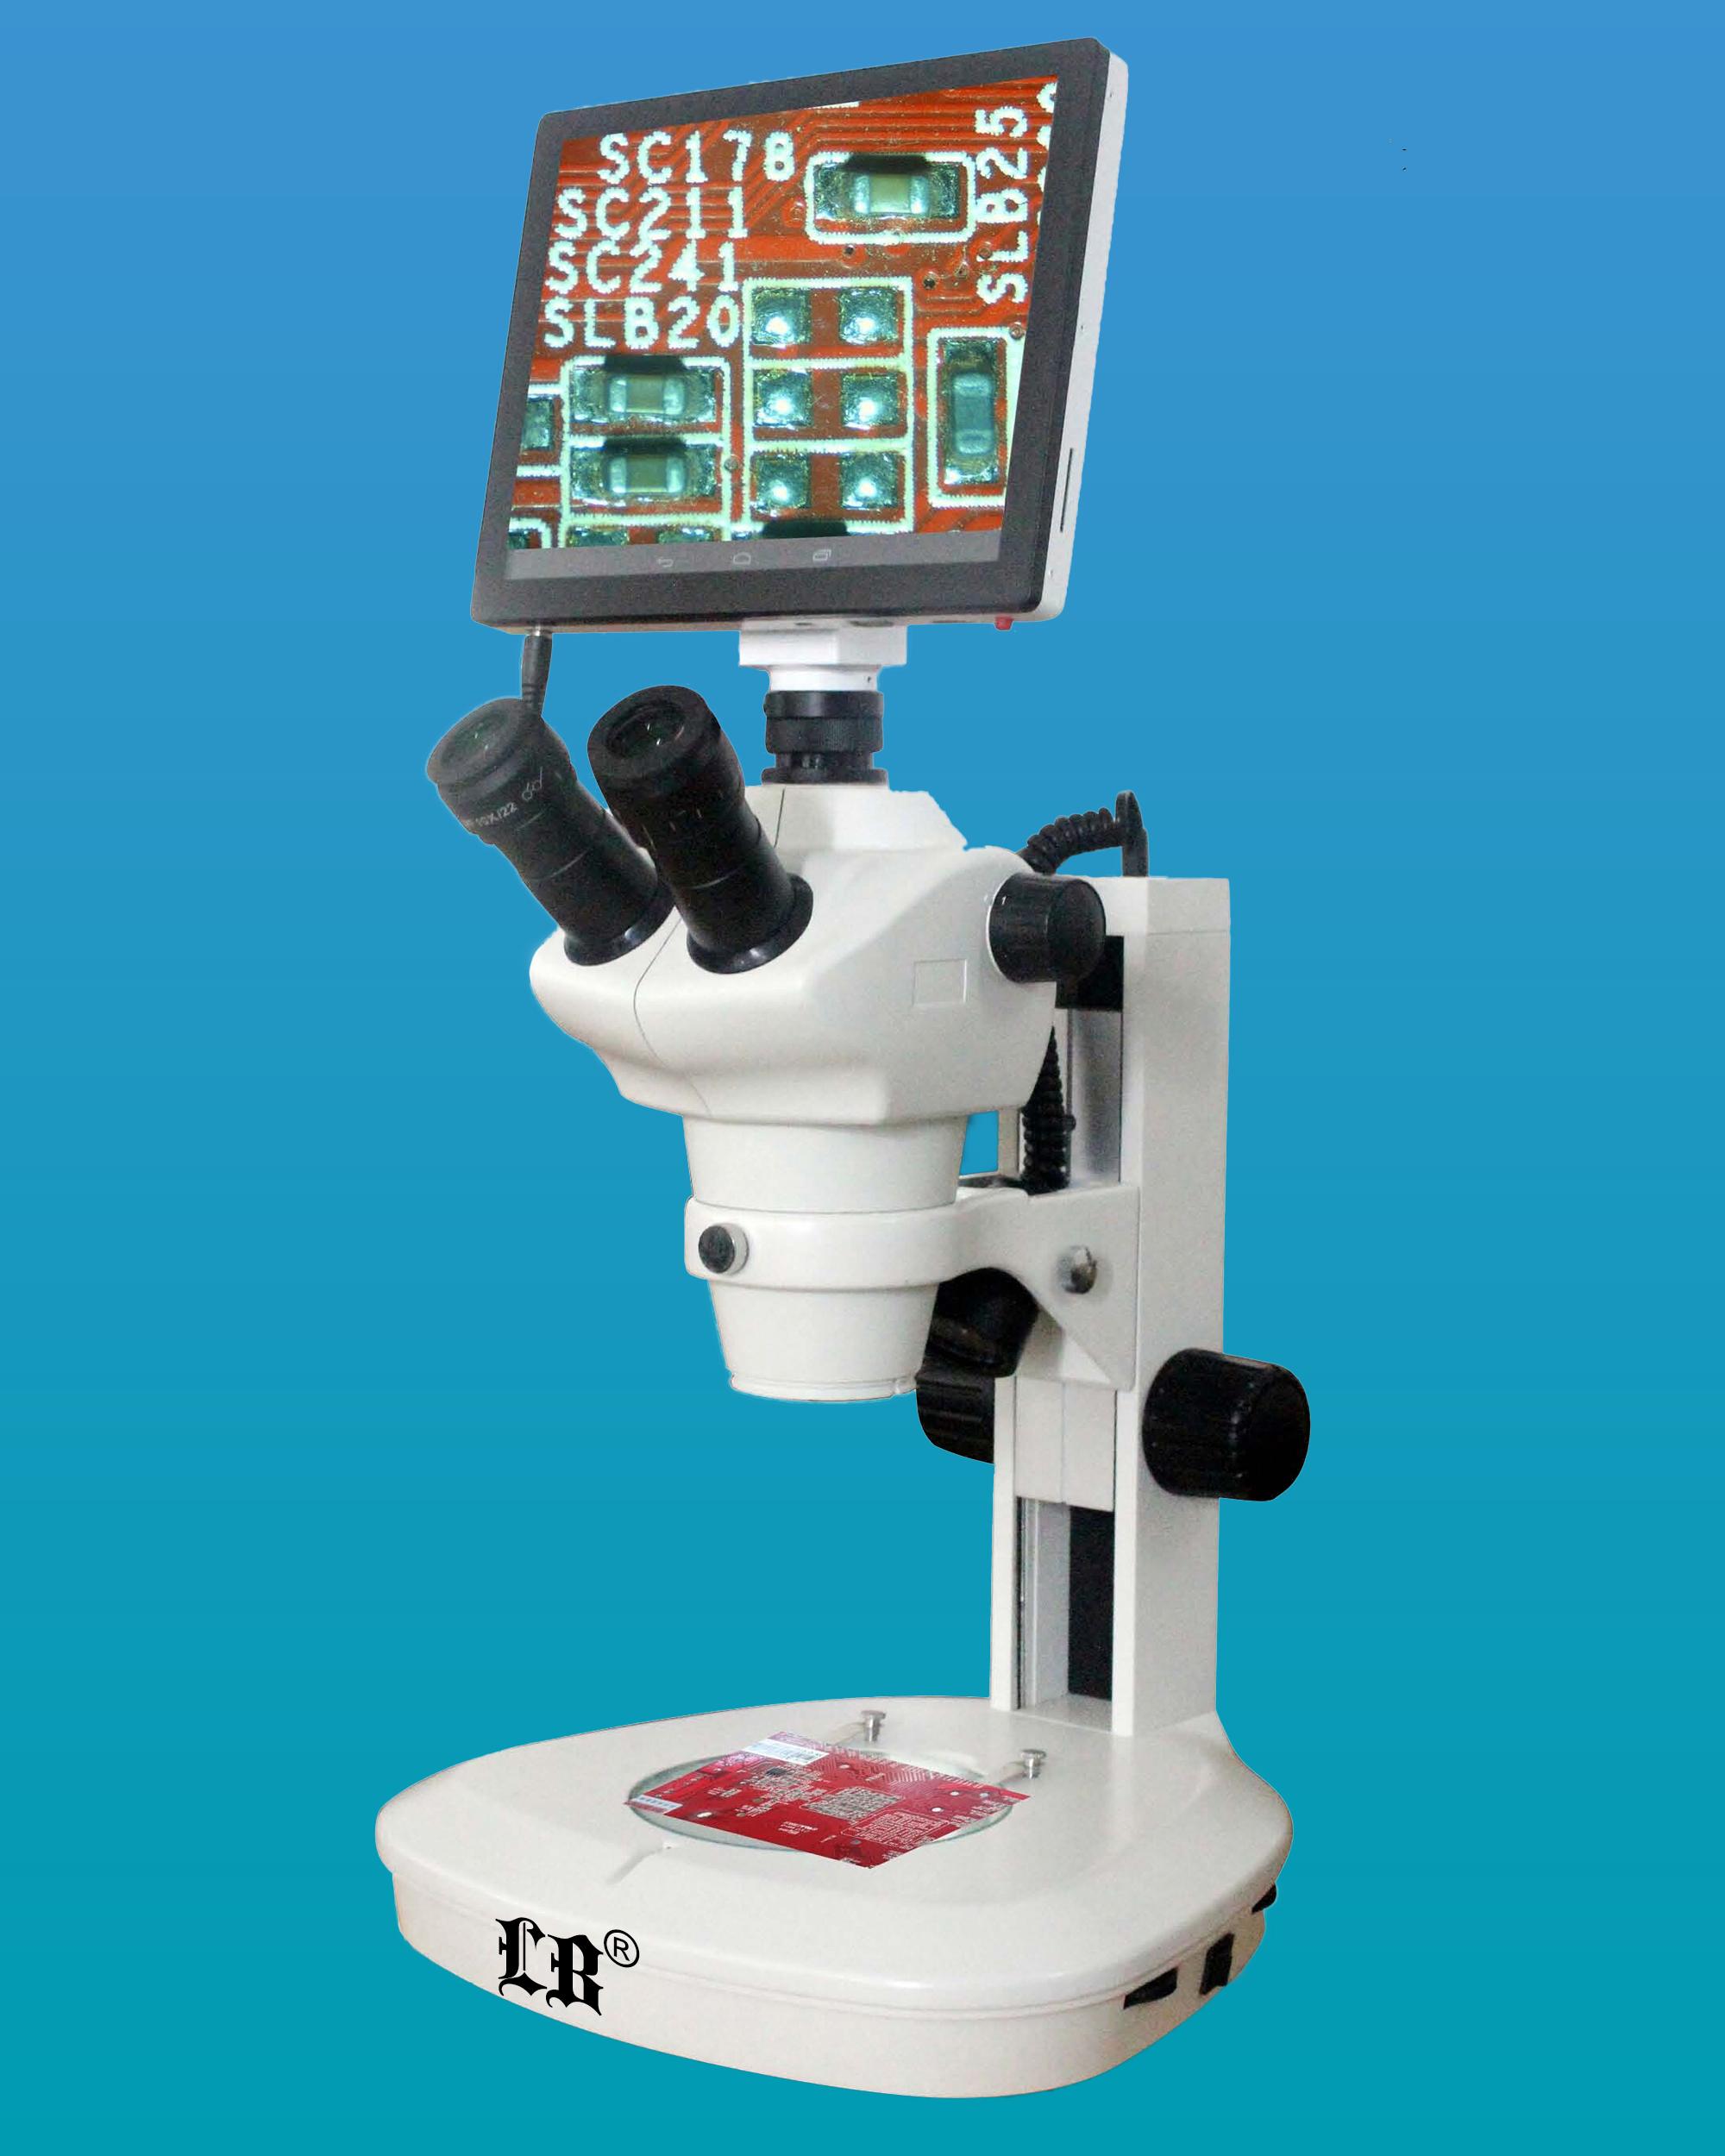 [LB-356] Digital Zoom Stereo Microscope w/ 5MP HD Touch Screen Digital Camera